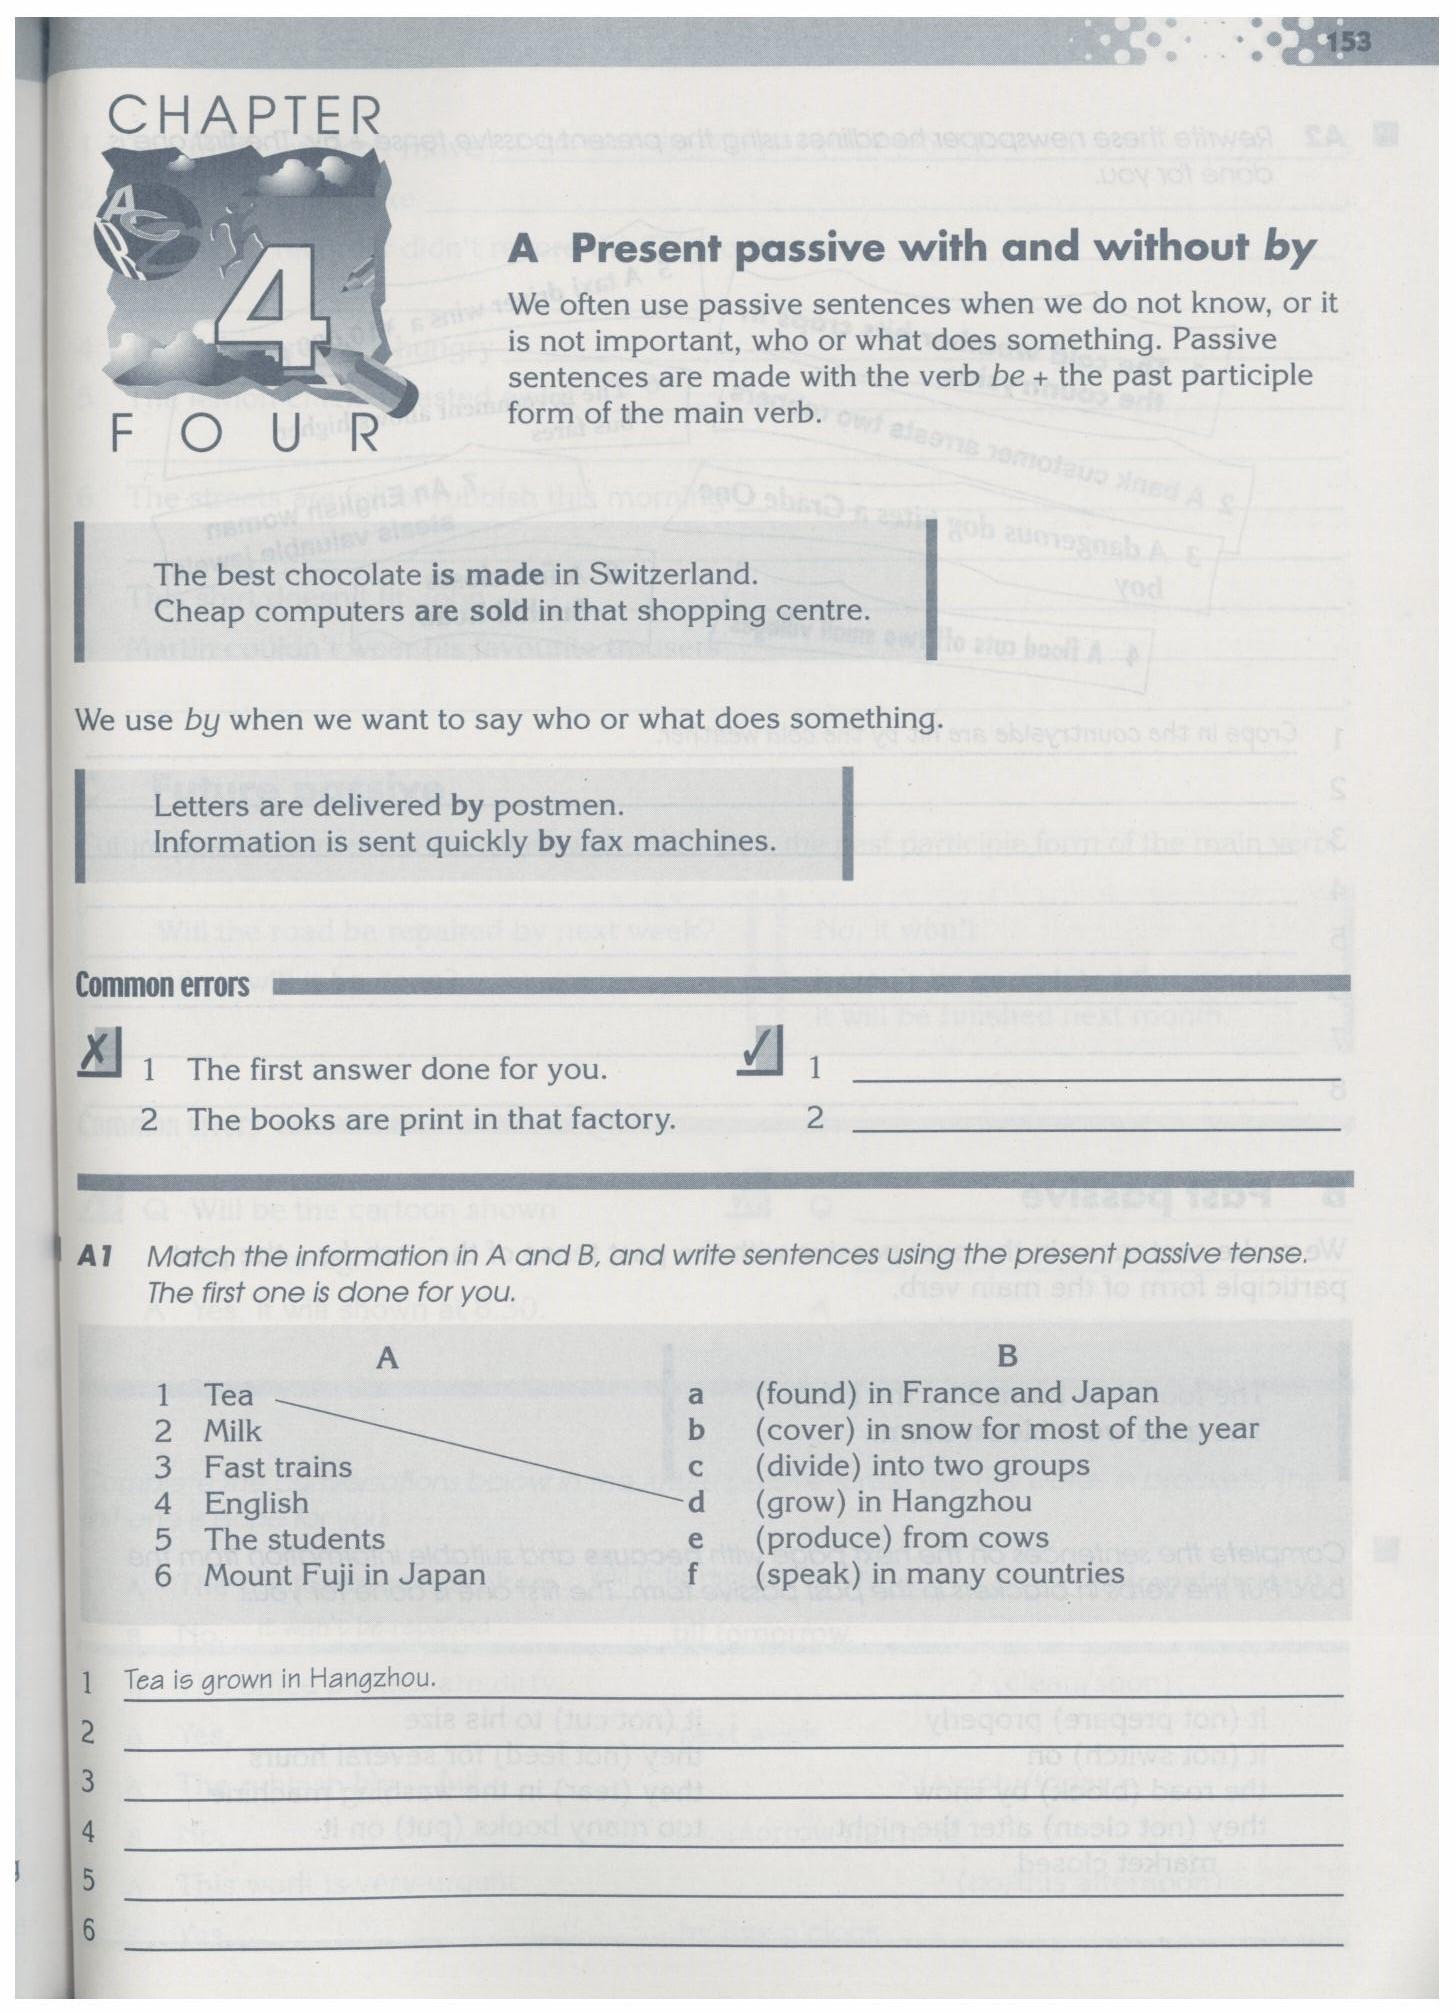 沈阳版牛津英语9A教材Chapter4-Grammar Practice Book